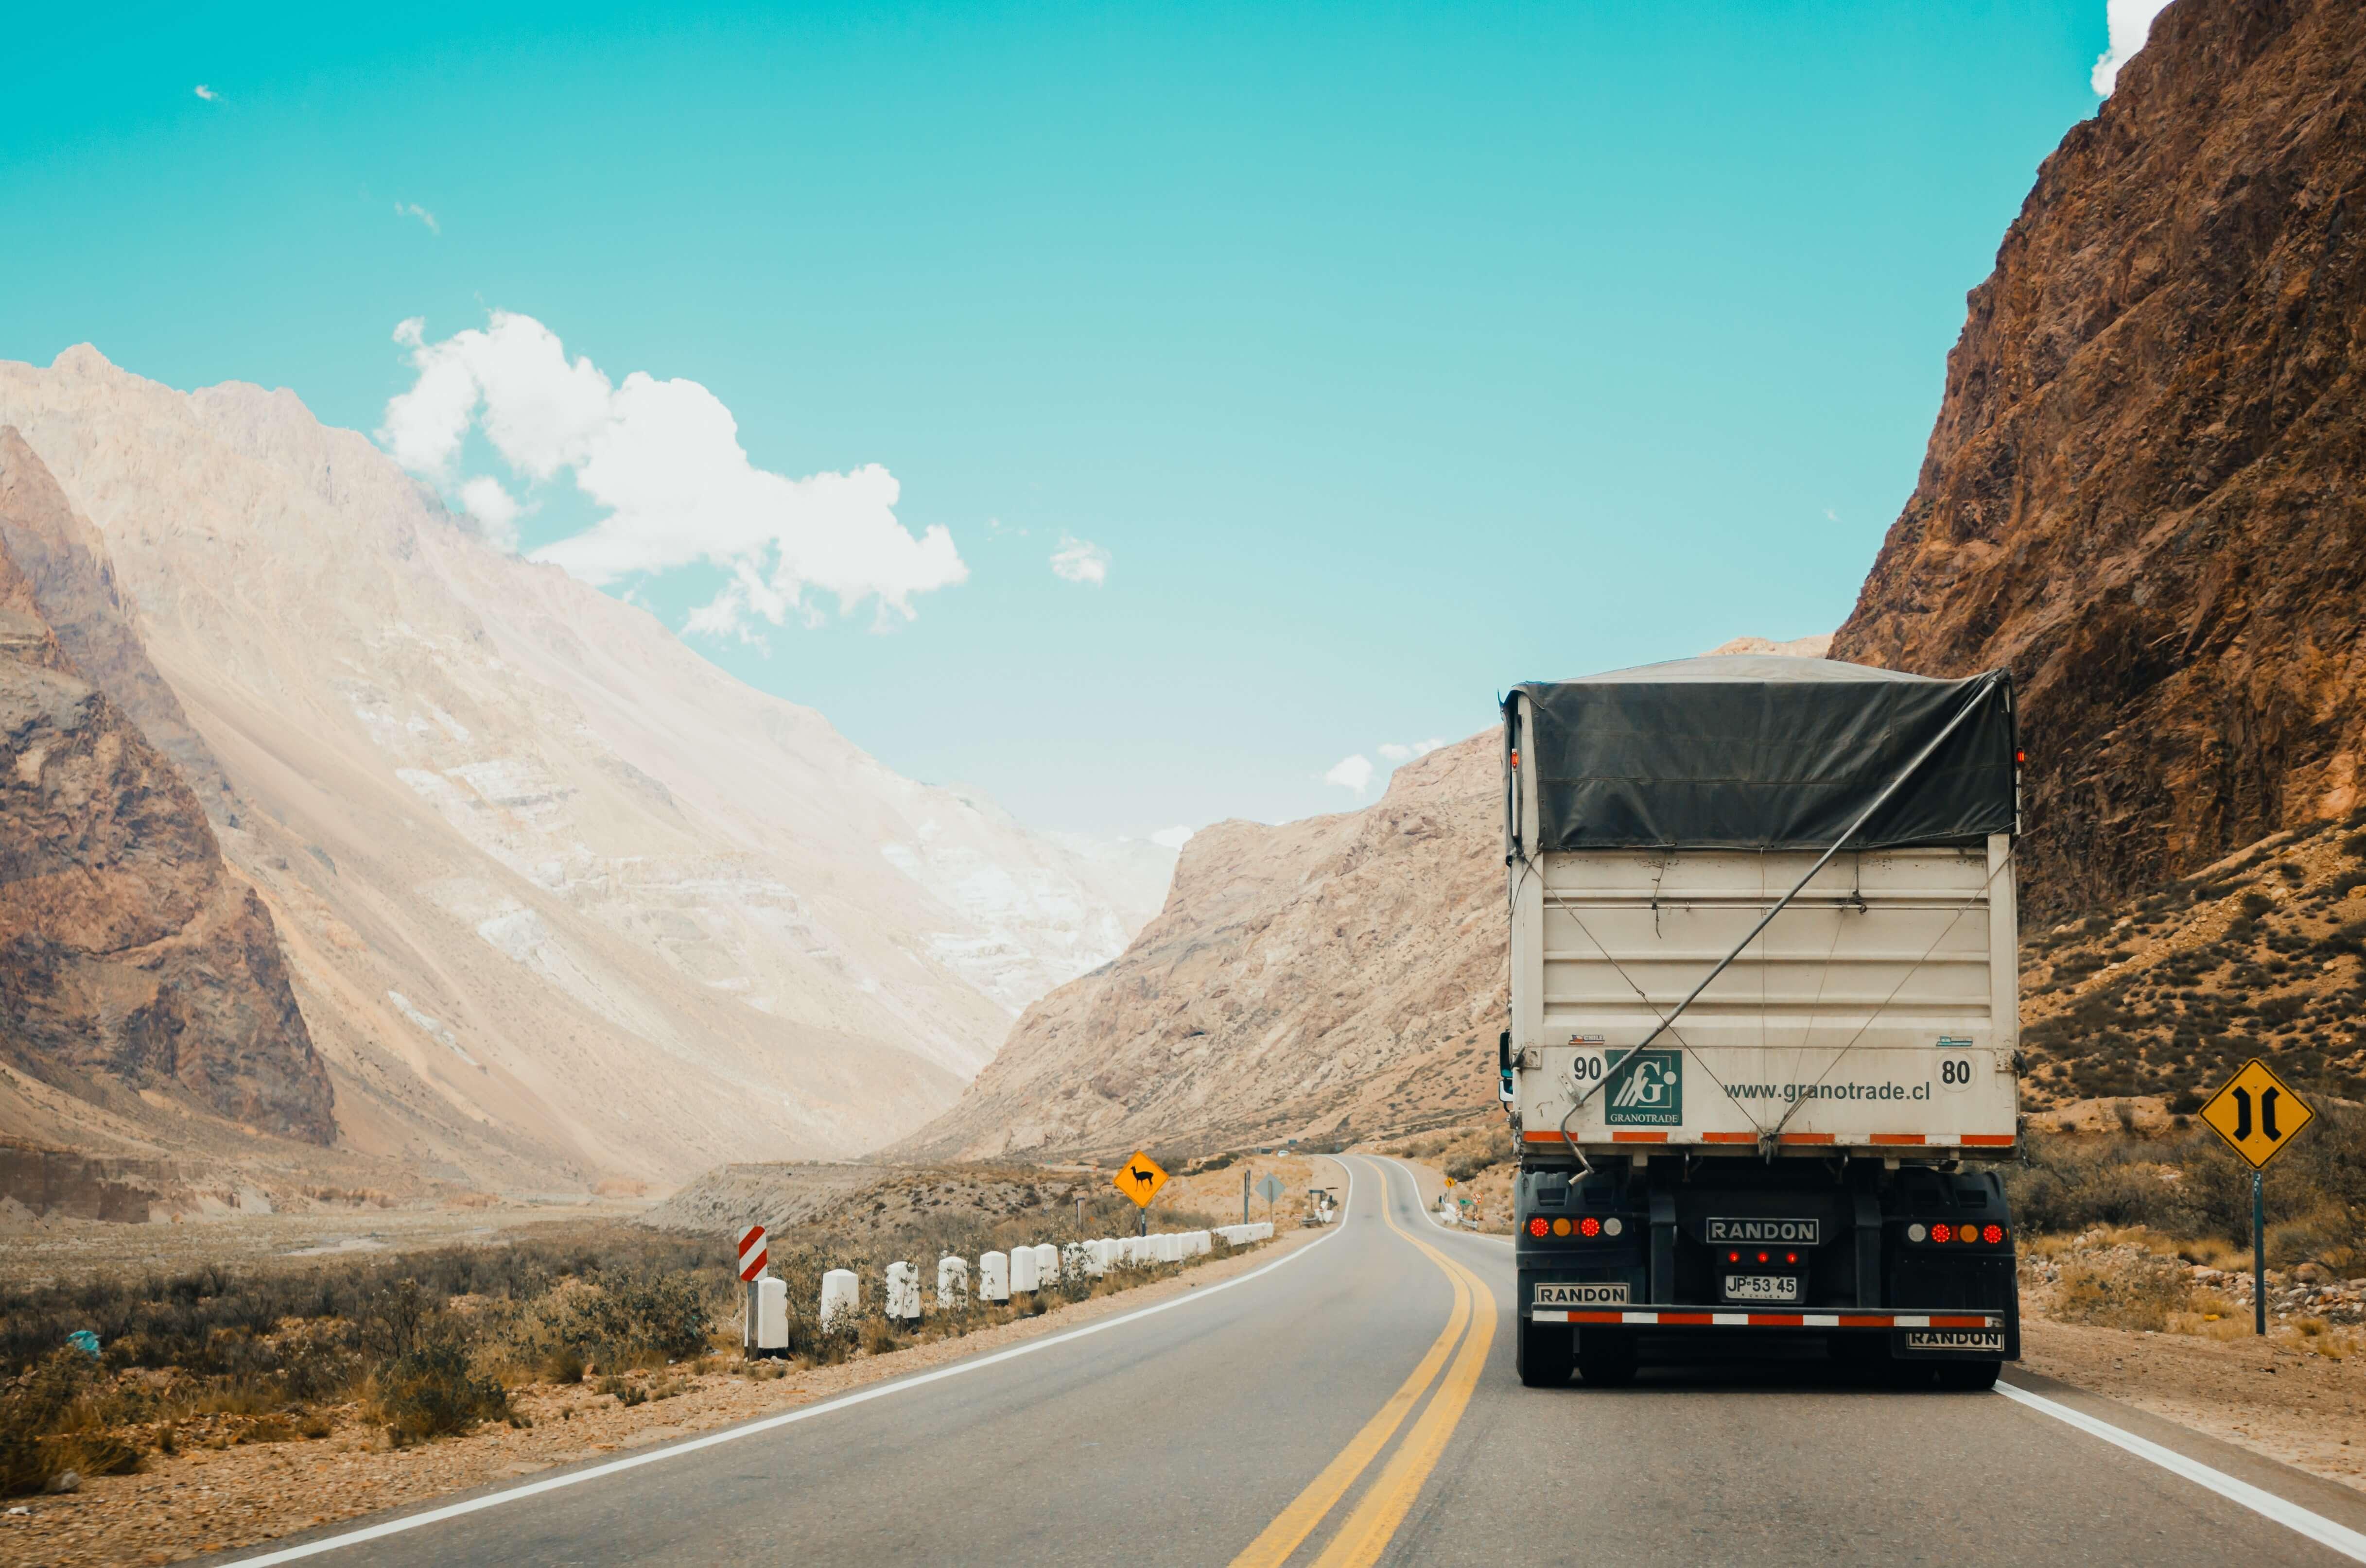 merchant haulage carrier haulage